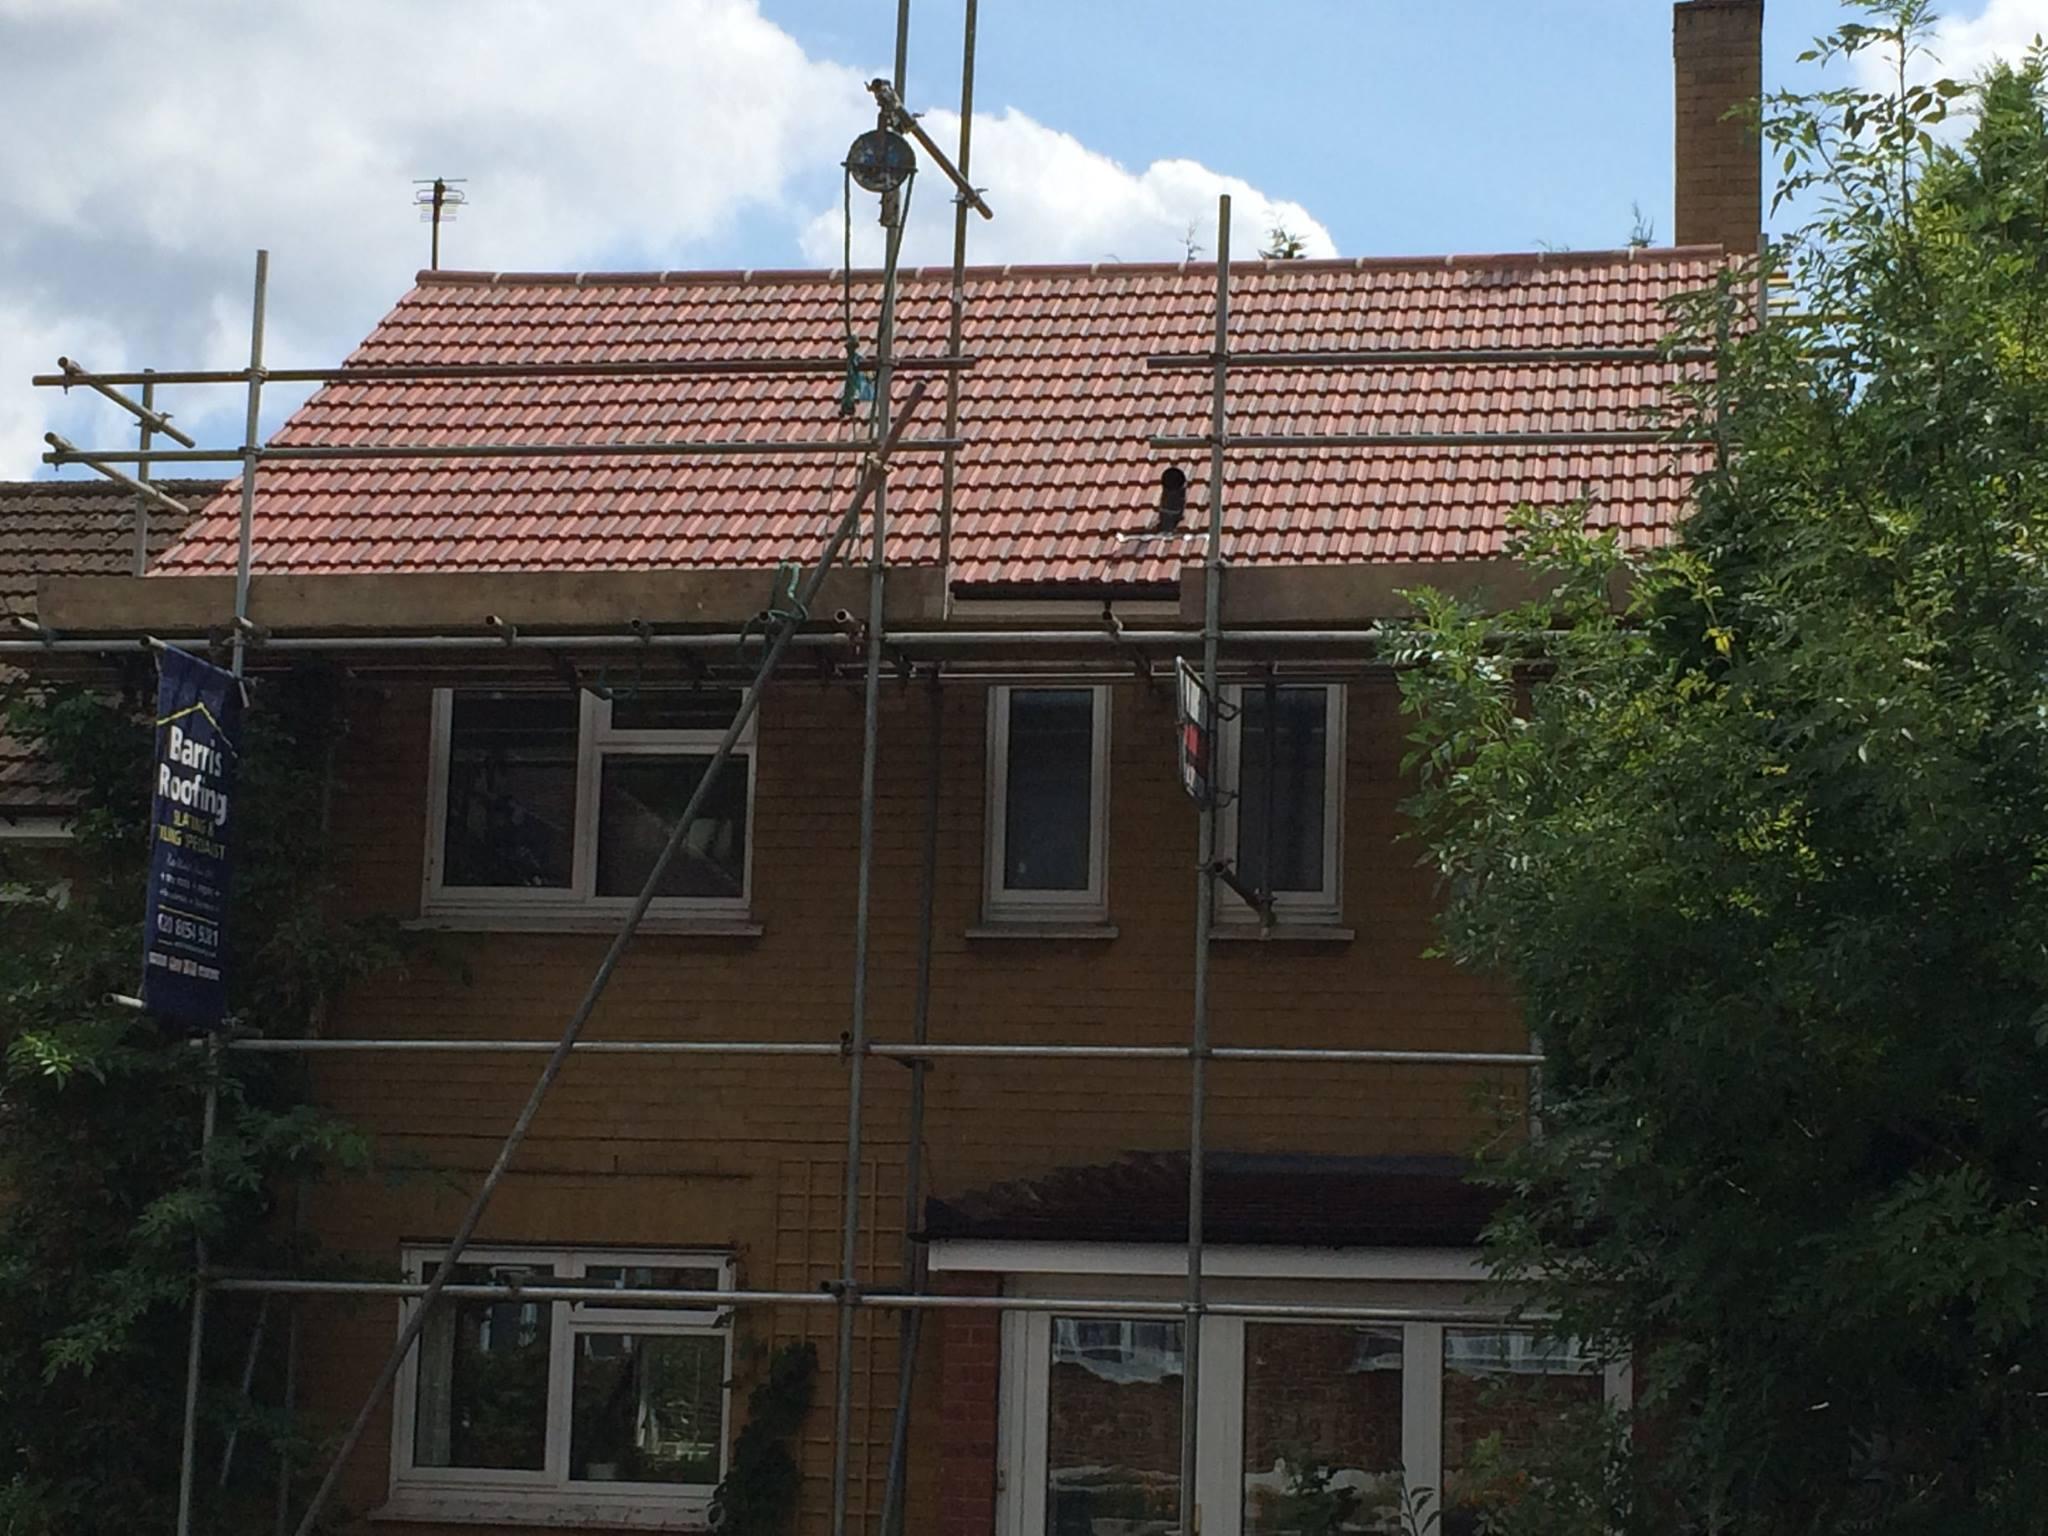 Redland 49s In Croydon Barris Roofing